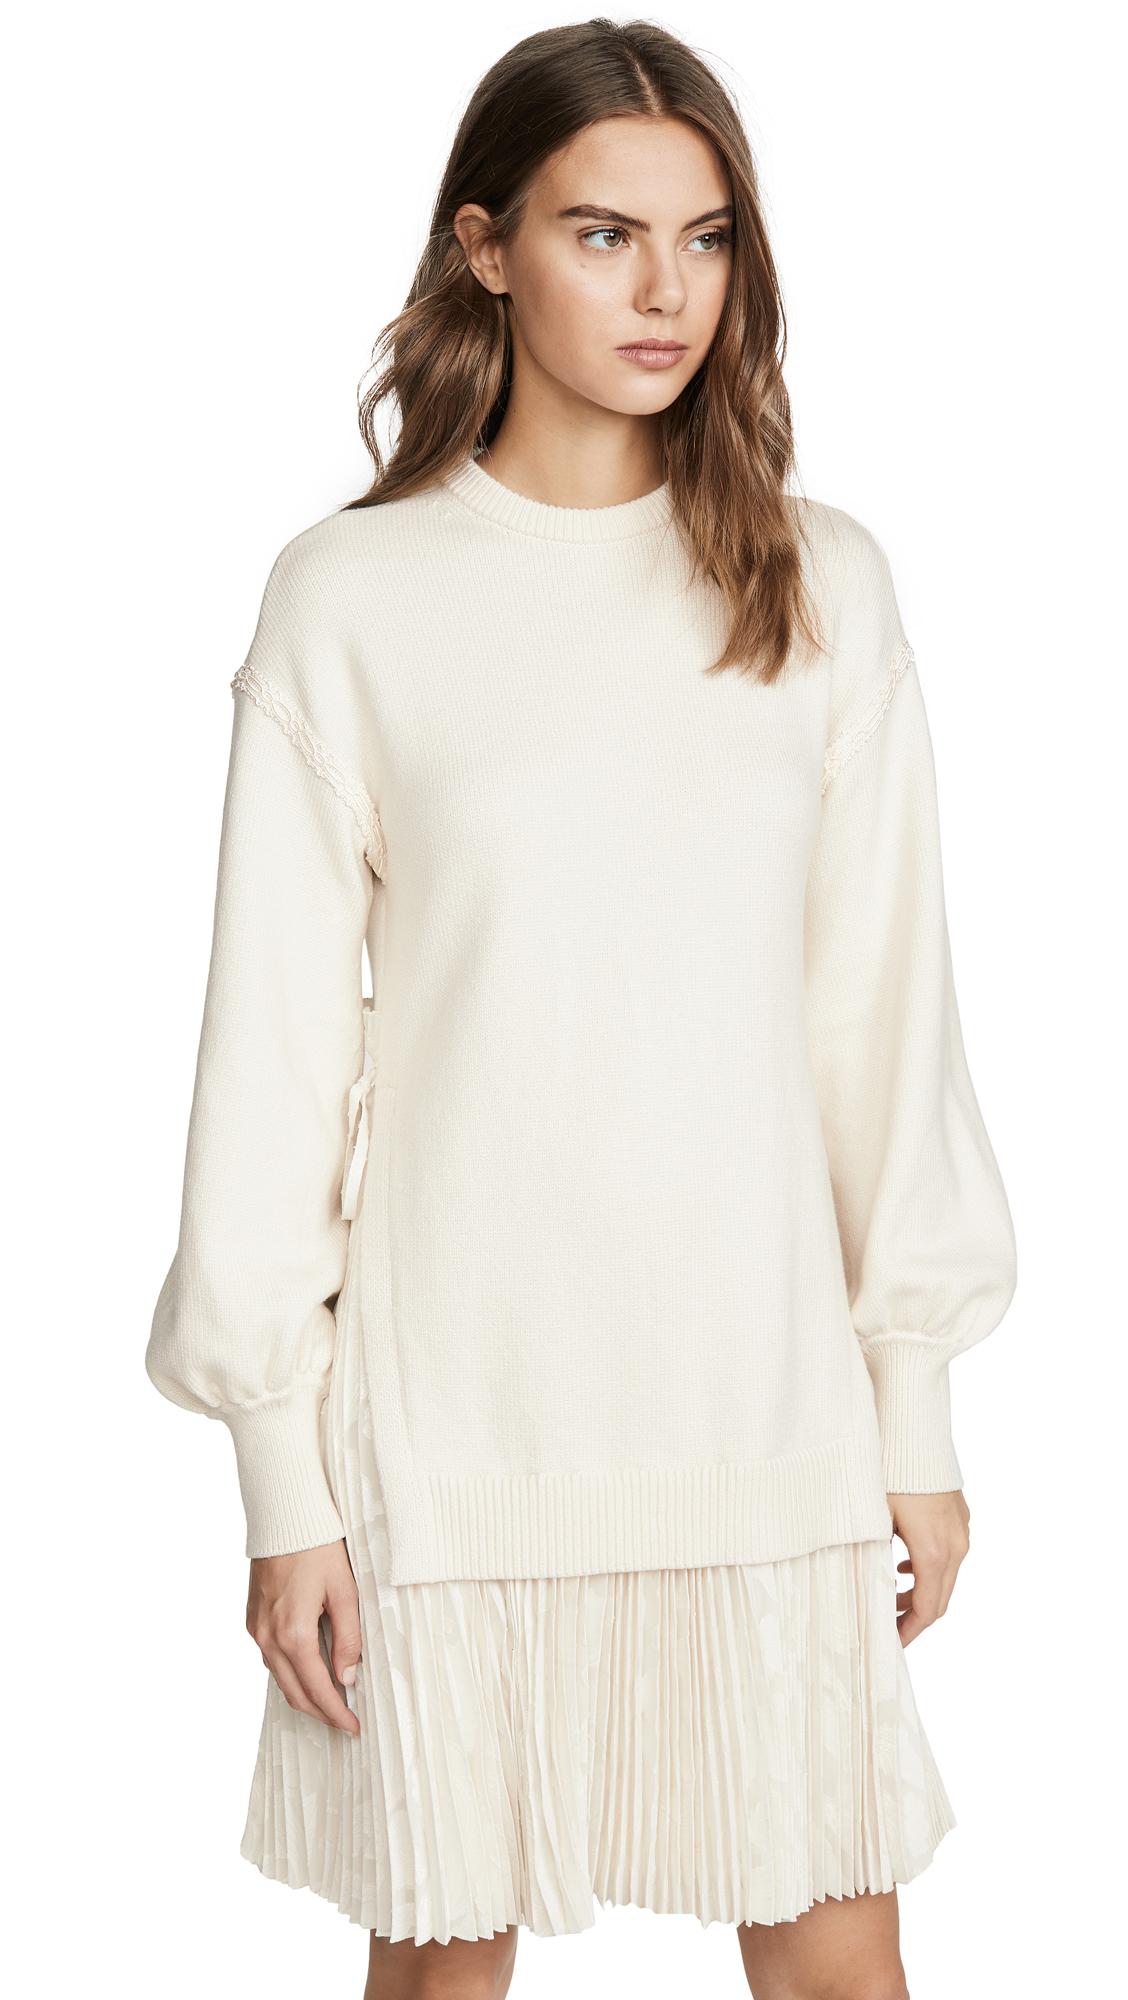 Adeam Pleated Sweater Dress - Ivory